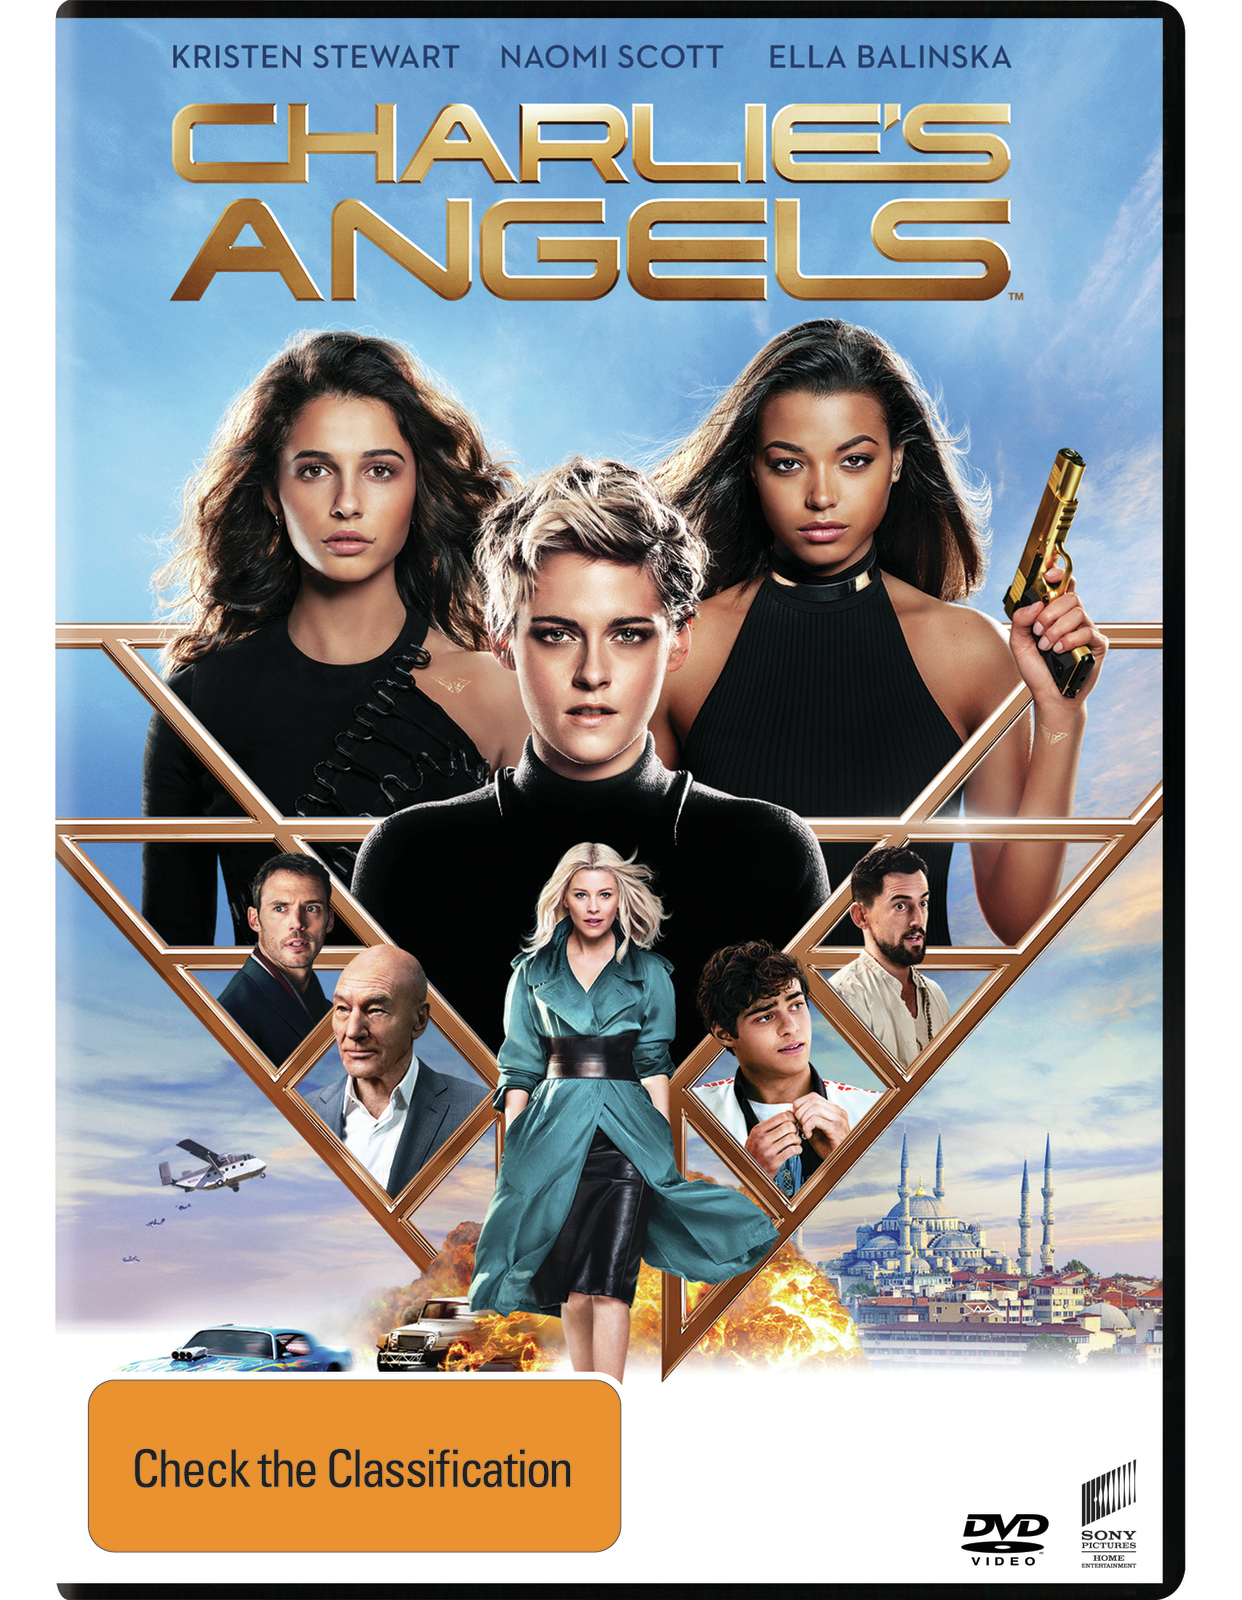 Charlie's Angels (2019) on DVD image